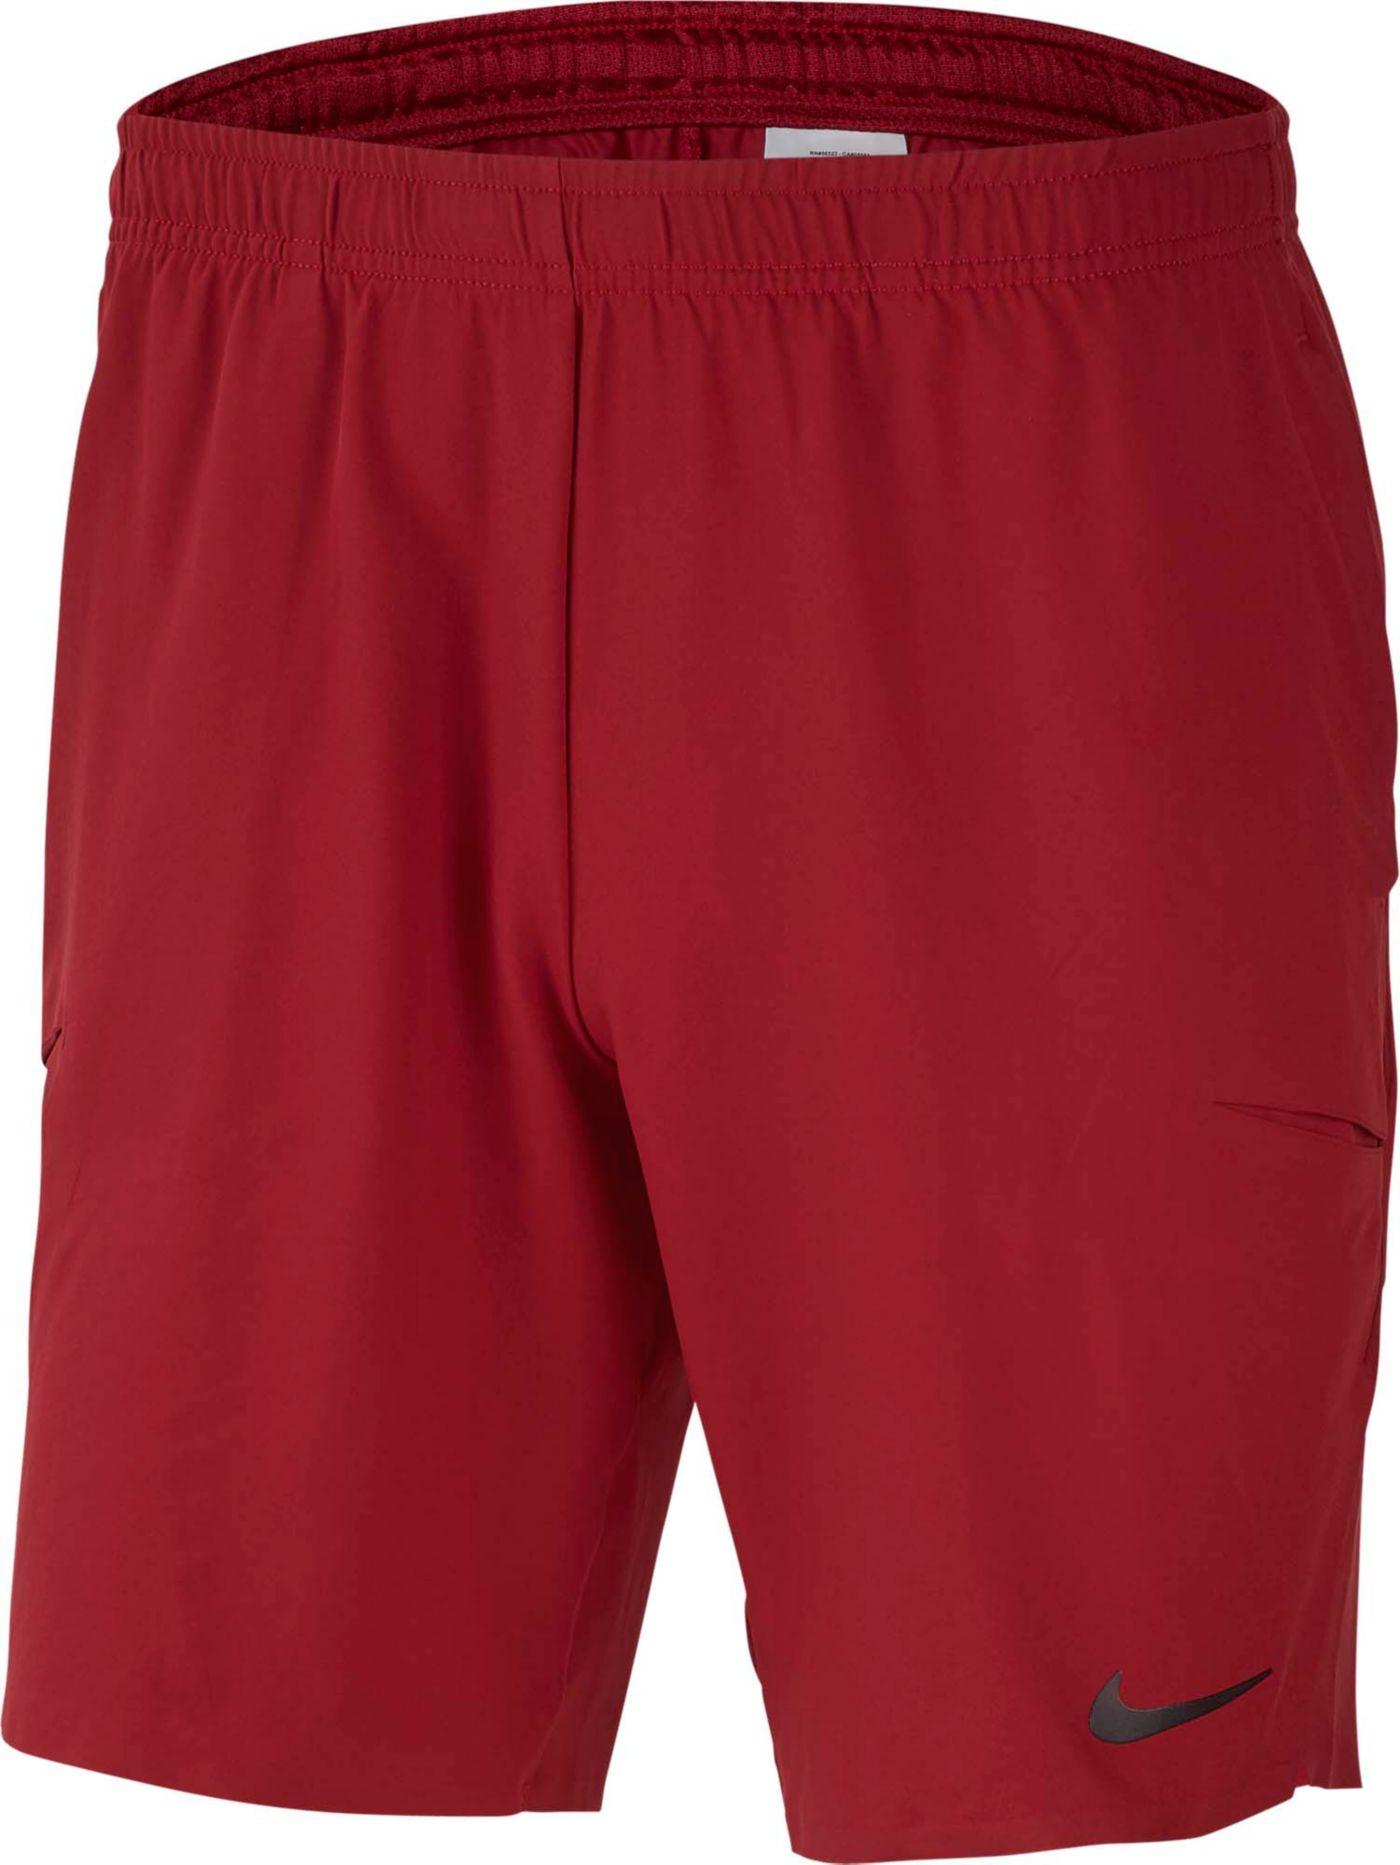 Nike Men's NikeCourt Flex Ace 9'' Tennis Shorts